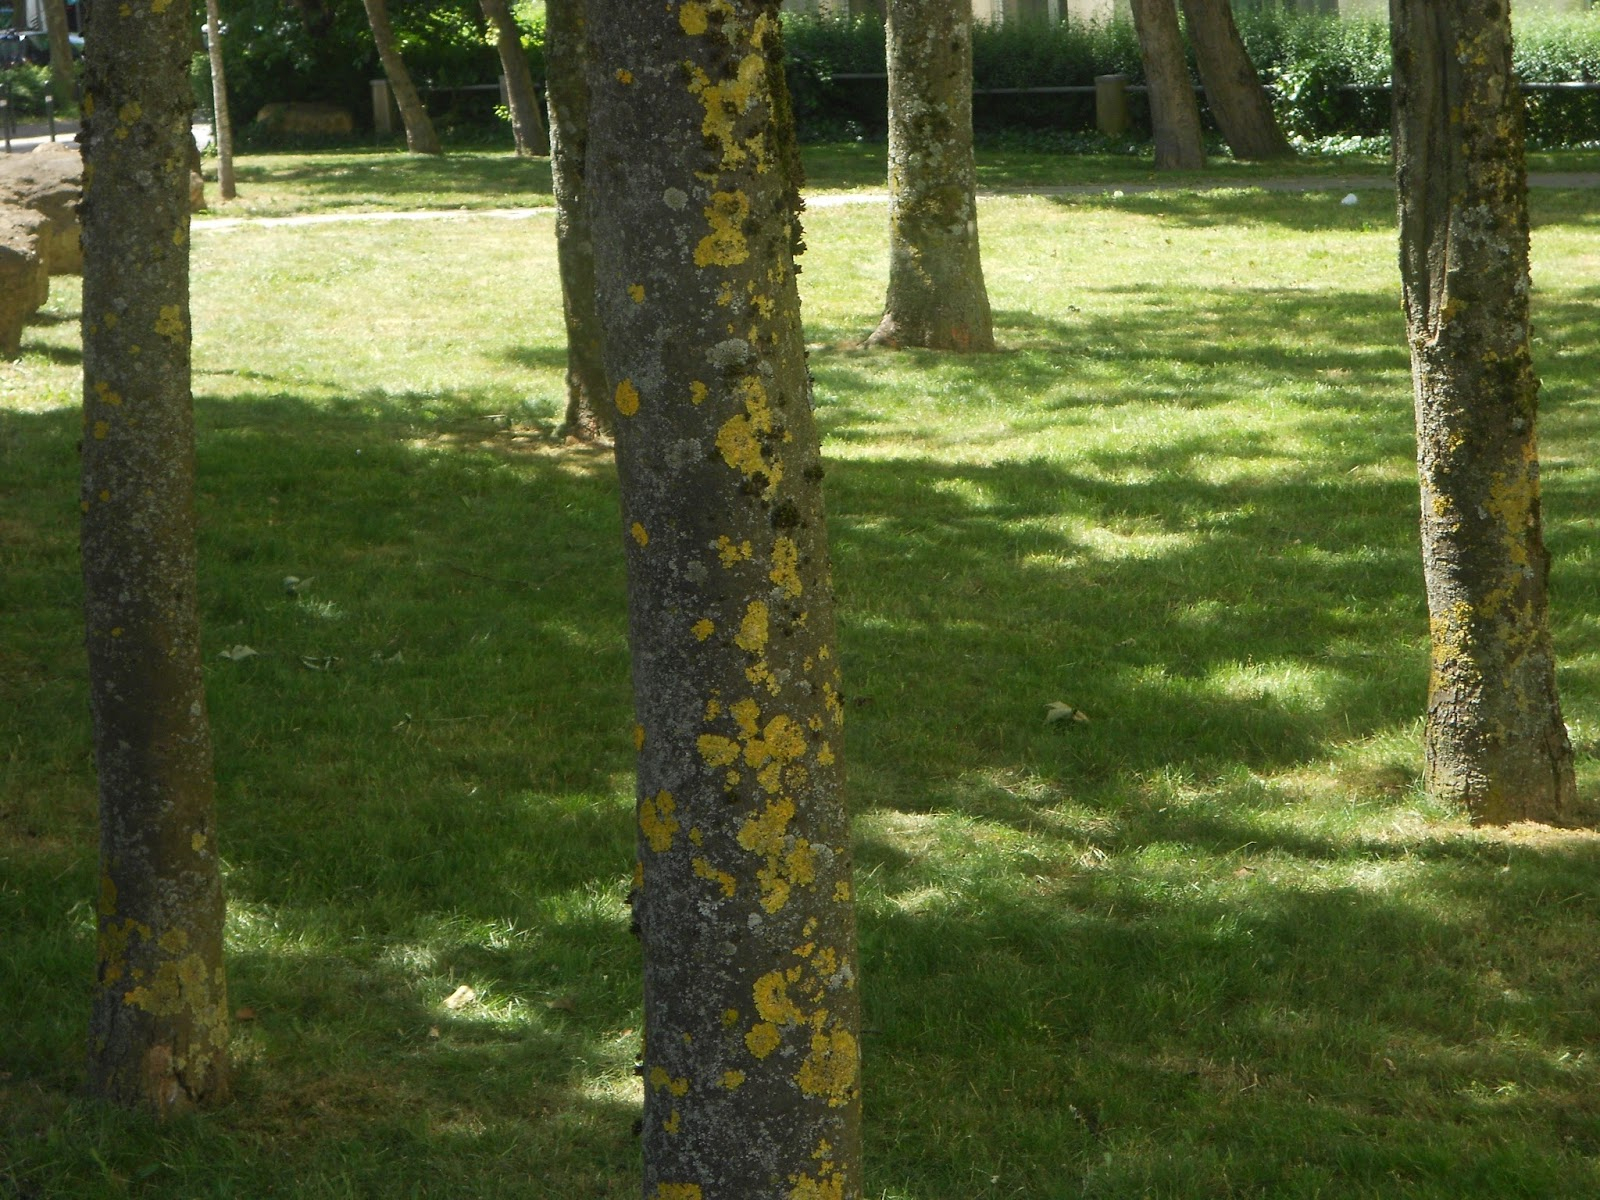 Le Jardin Sauvage Ana Nb: Le Silence De L' Écorce dedans Ecorces Jardin